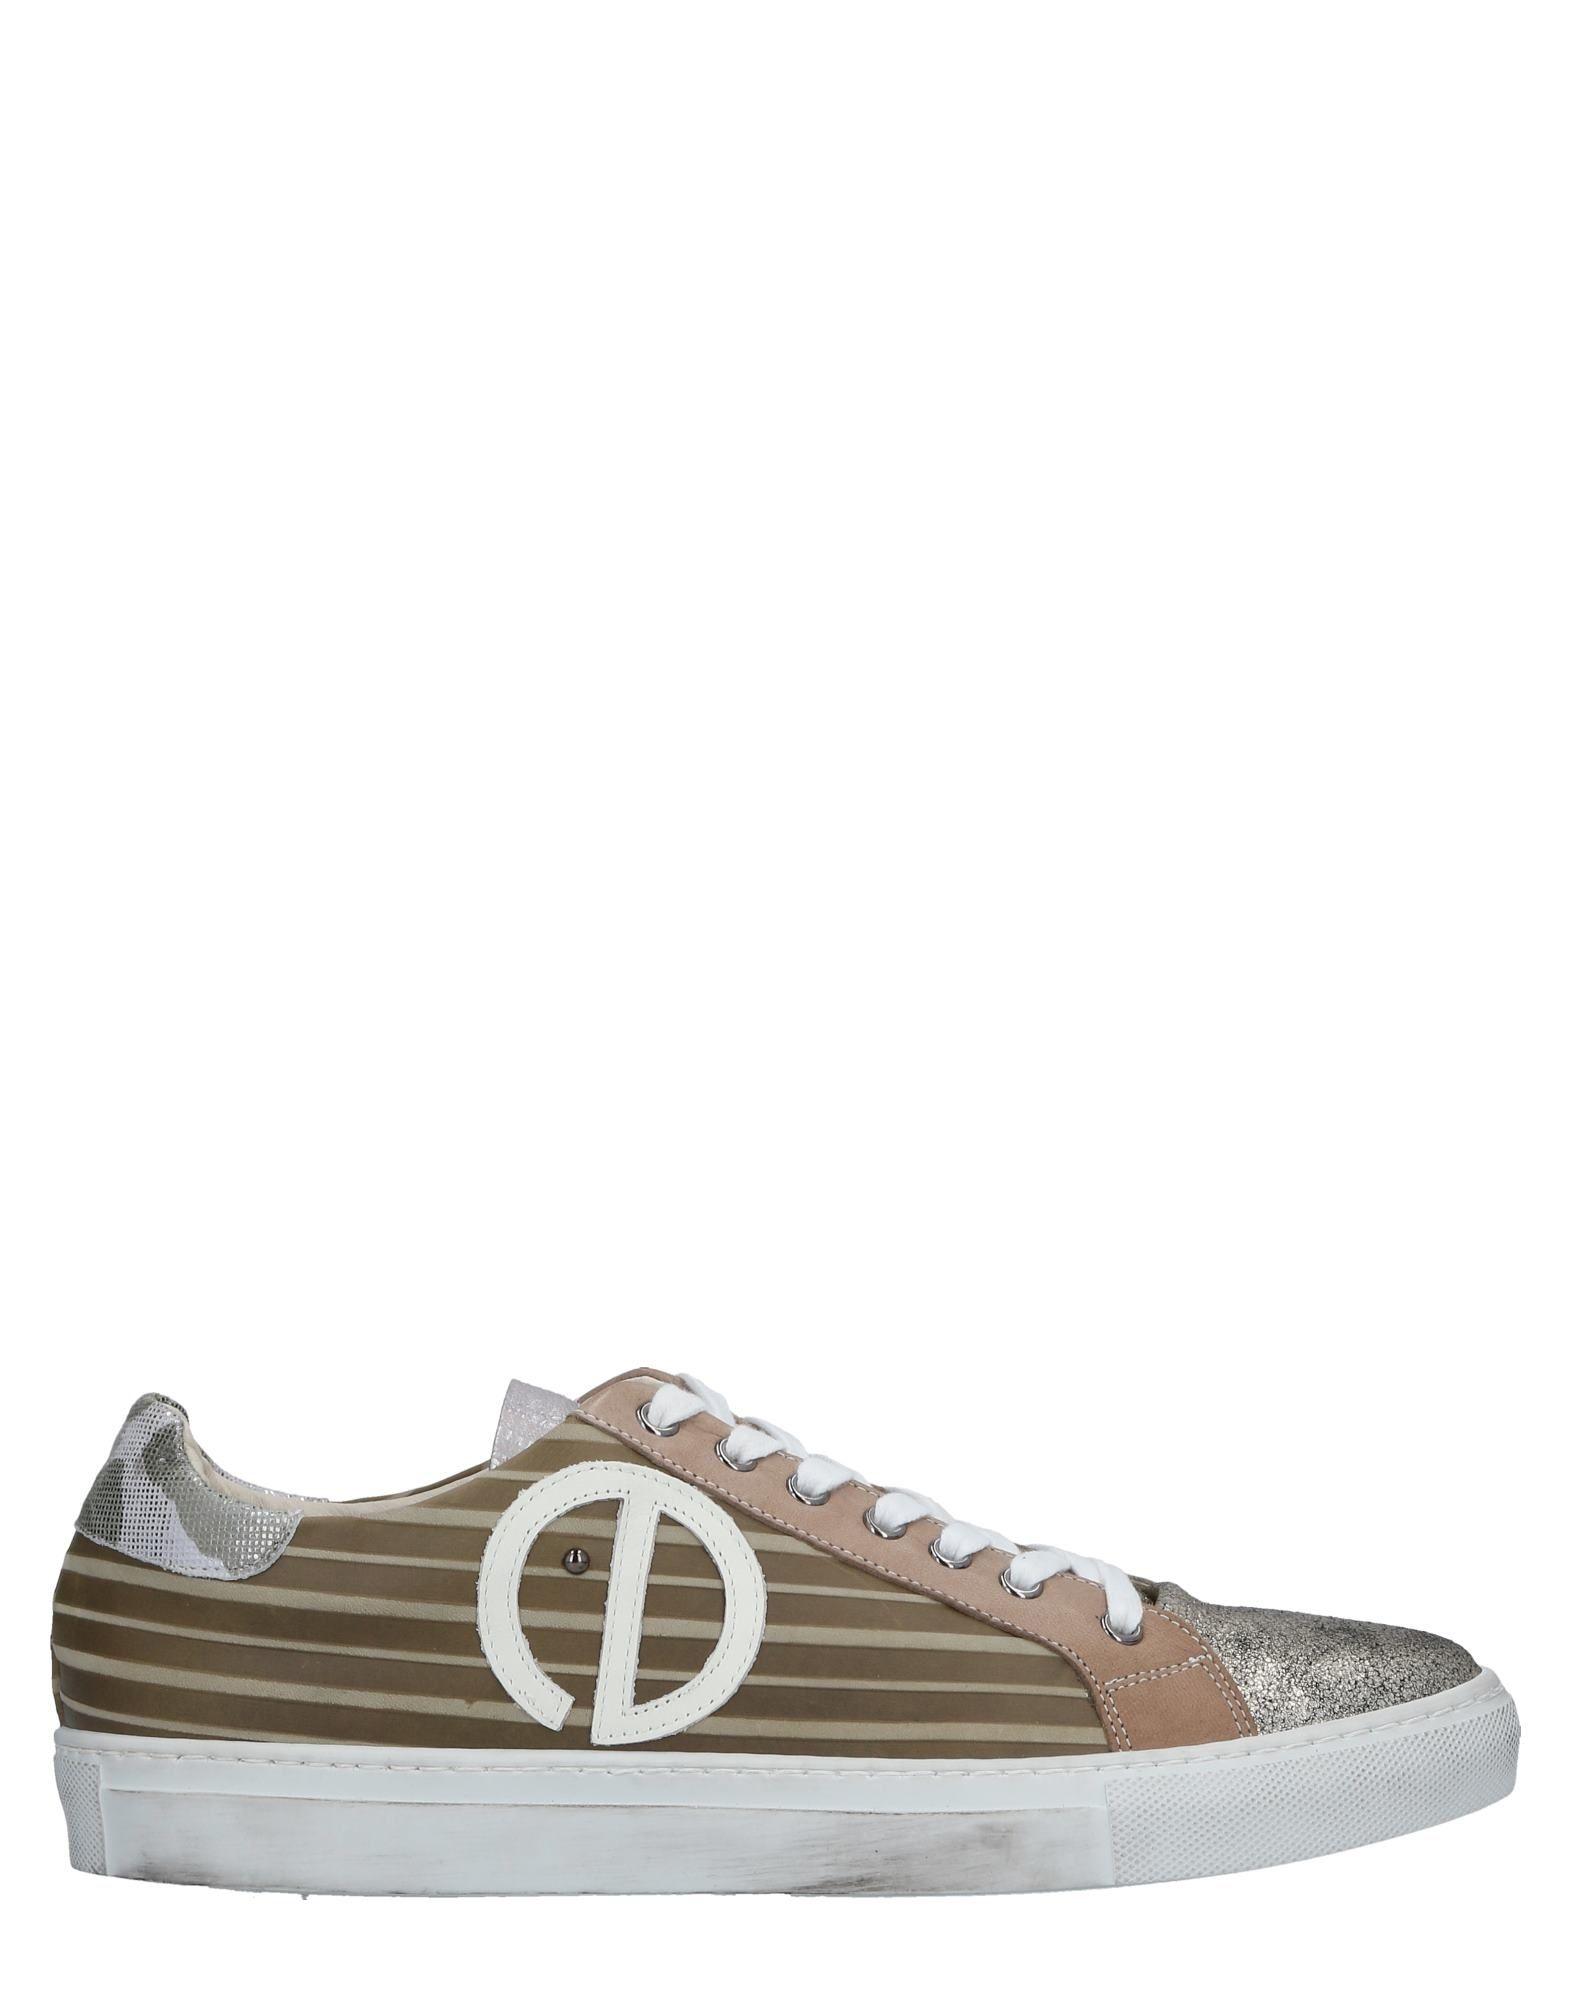 Rabatt echte Schuhe Ebarrito Sneakers Herren  11521318FO